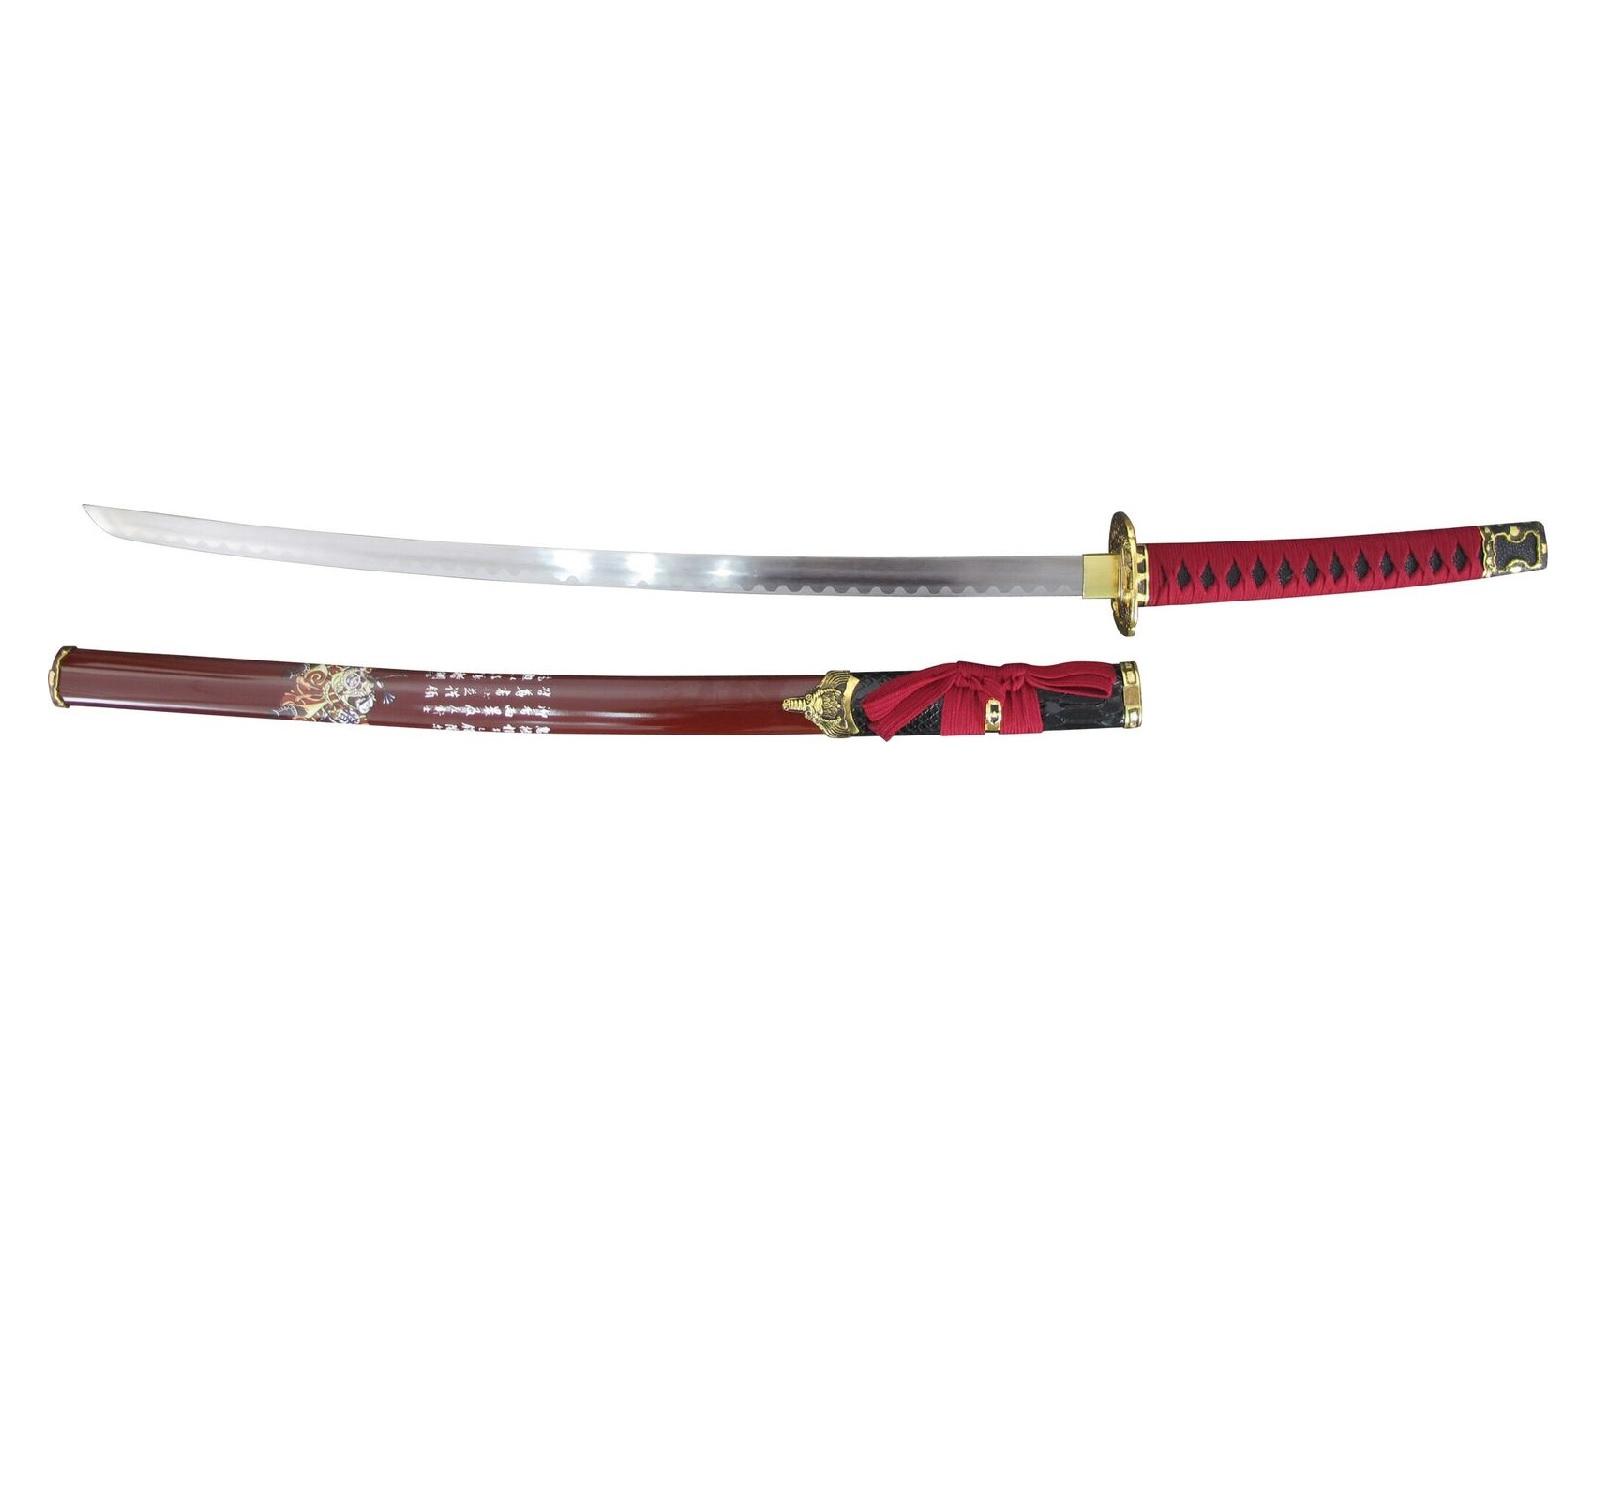 Master Cutlery SW-90RD Samurai Sword 26.50 in Blade